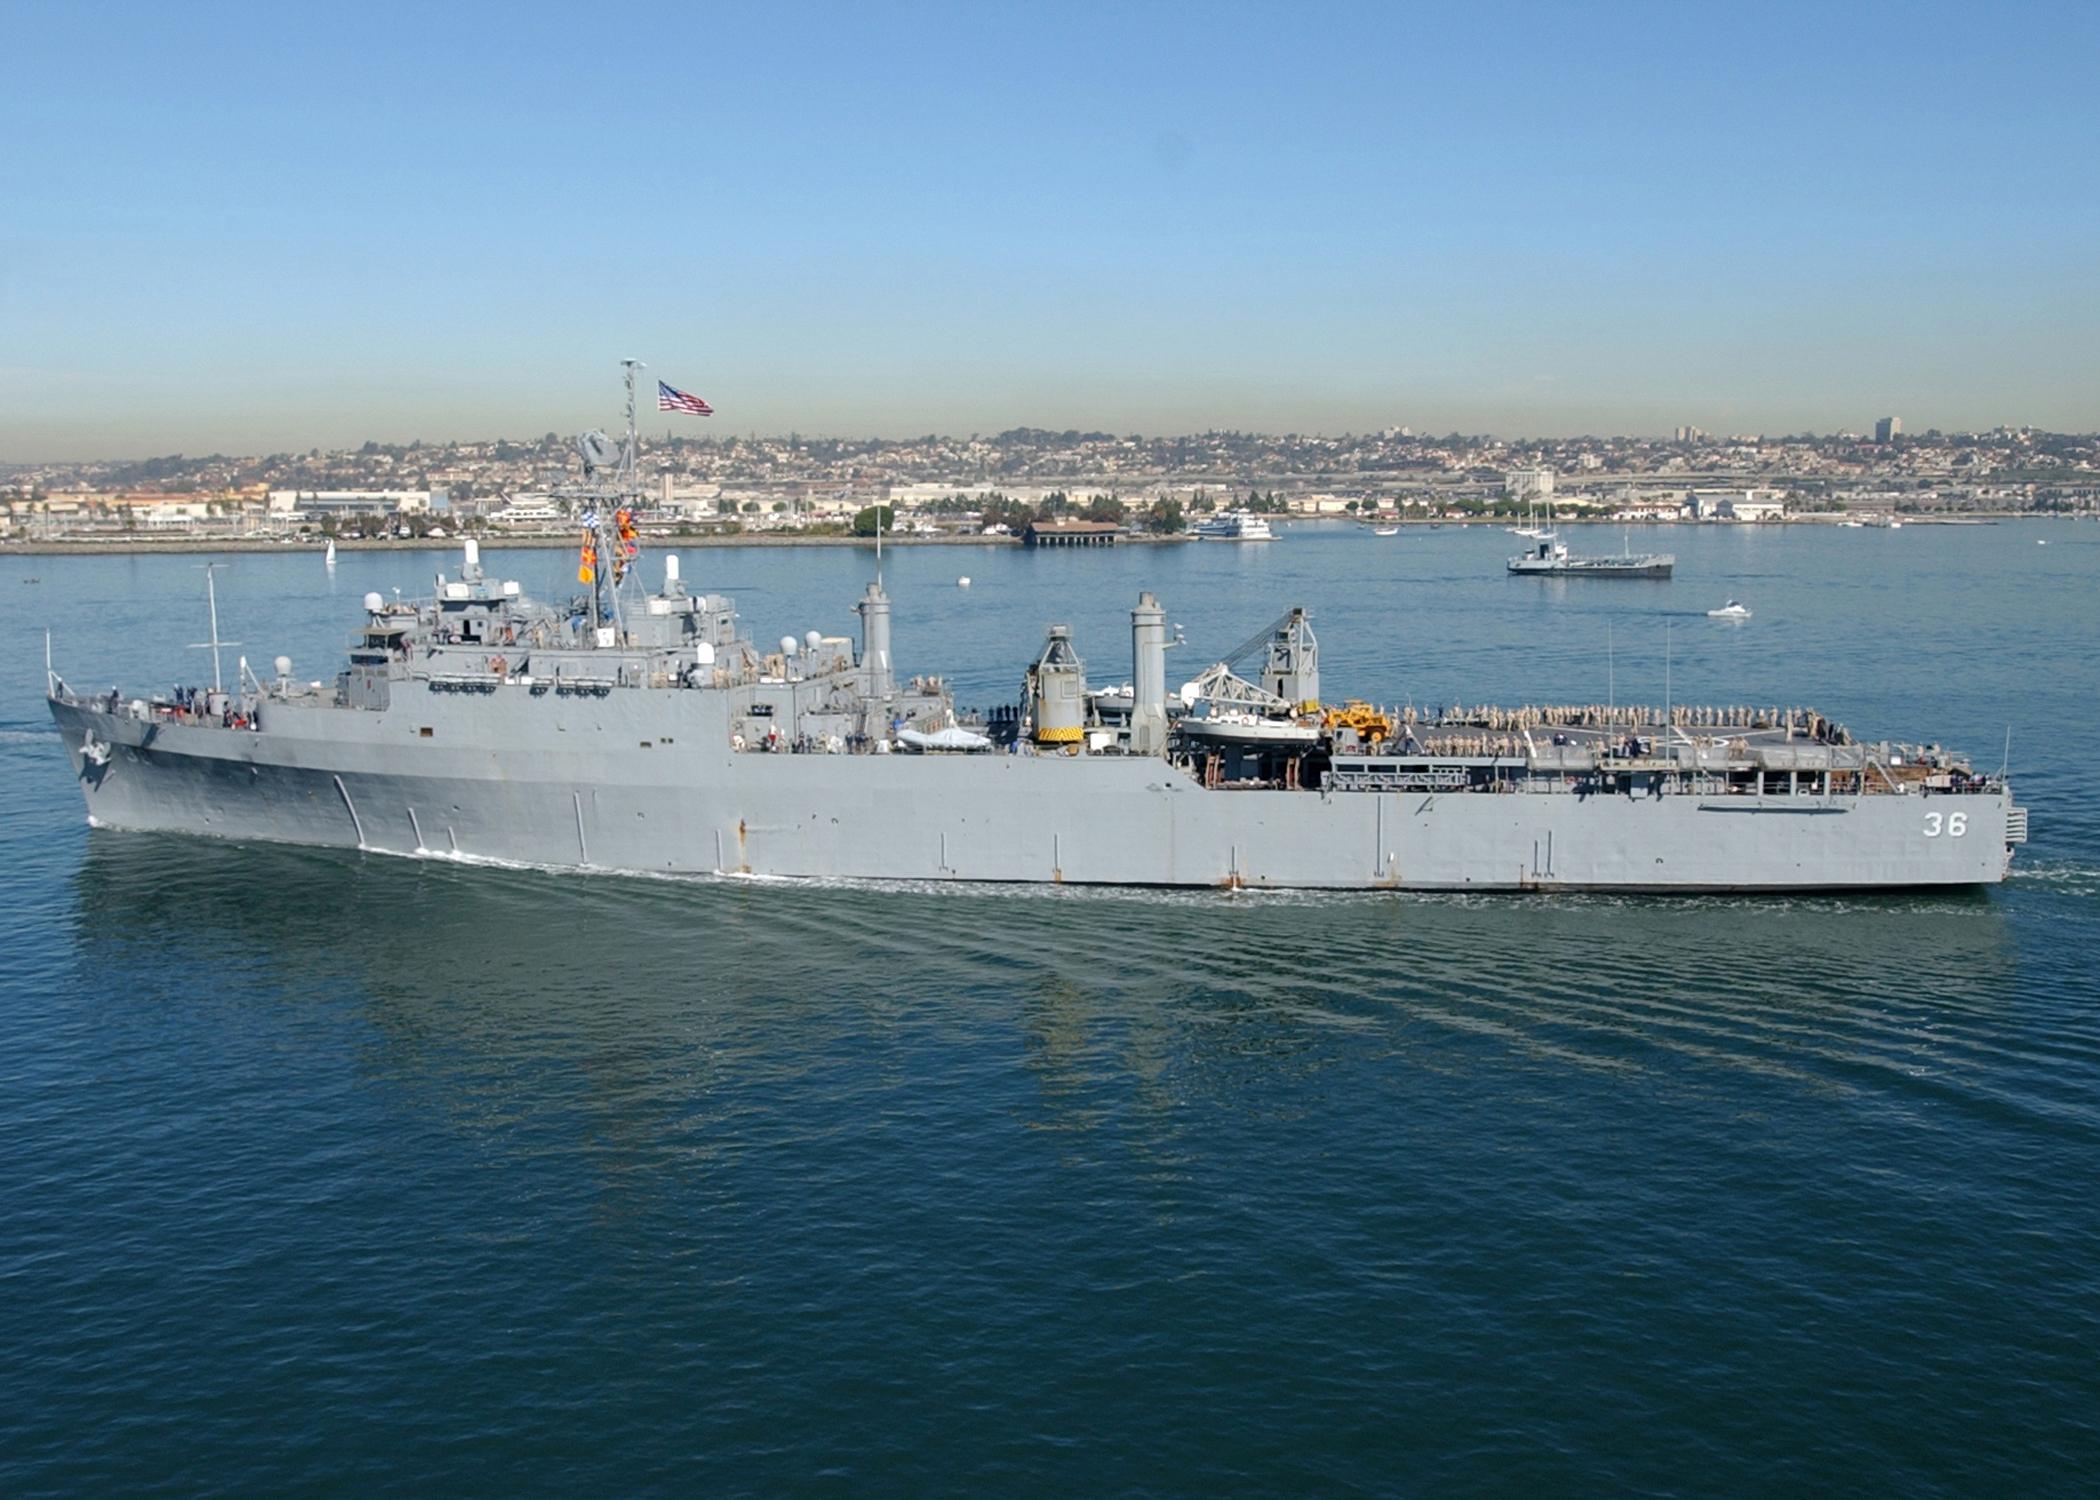 Anchorage-class dock landing ship   Military Wiki   FANDOM powered by Wikia